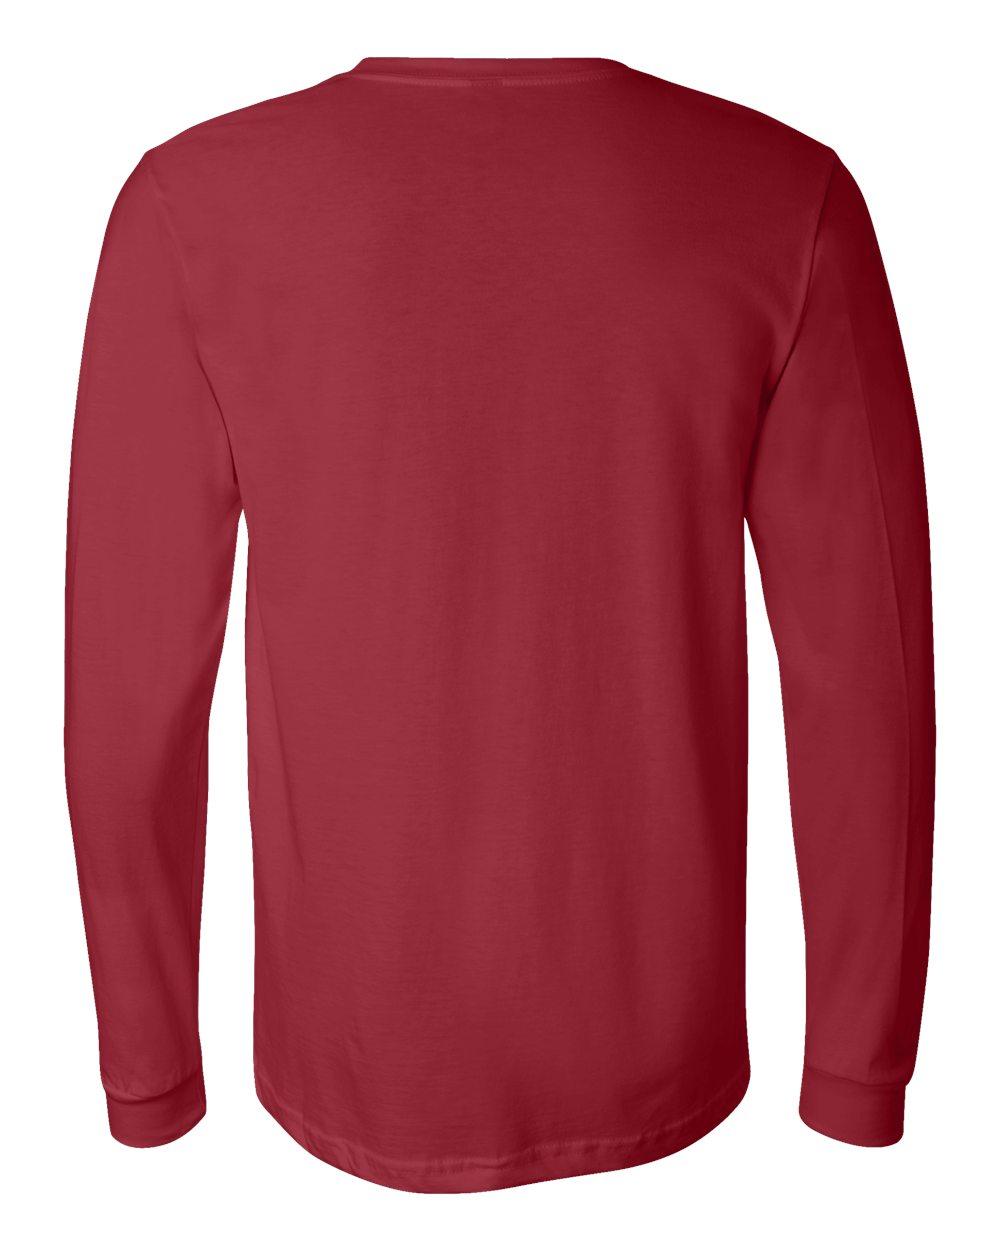 Bella-Canvas-Mens-Blank-Top-Long-Sleeve-Jersey-Tee-T-Shirt-3501-up-to-3XL thumbnail 28